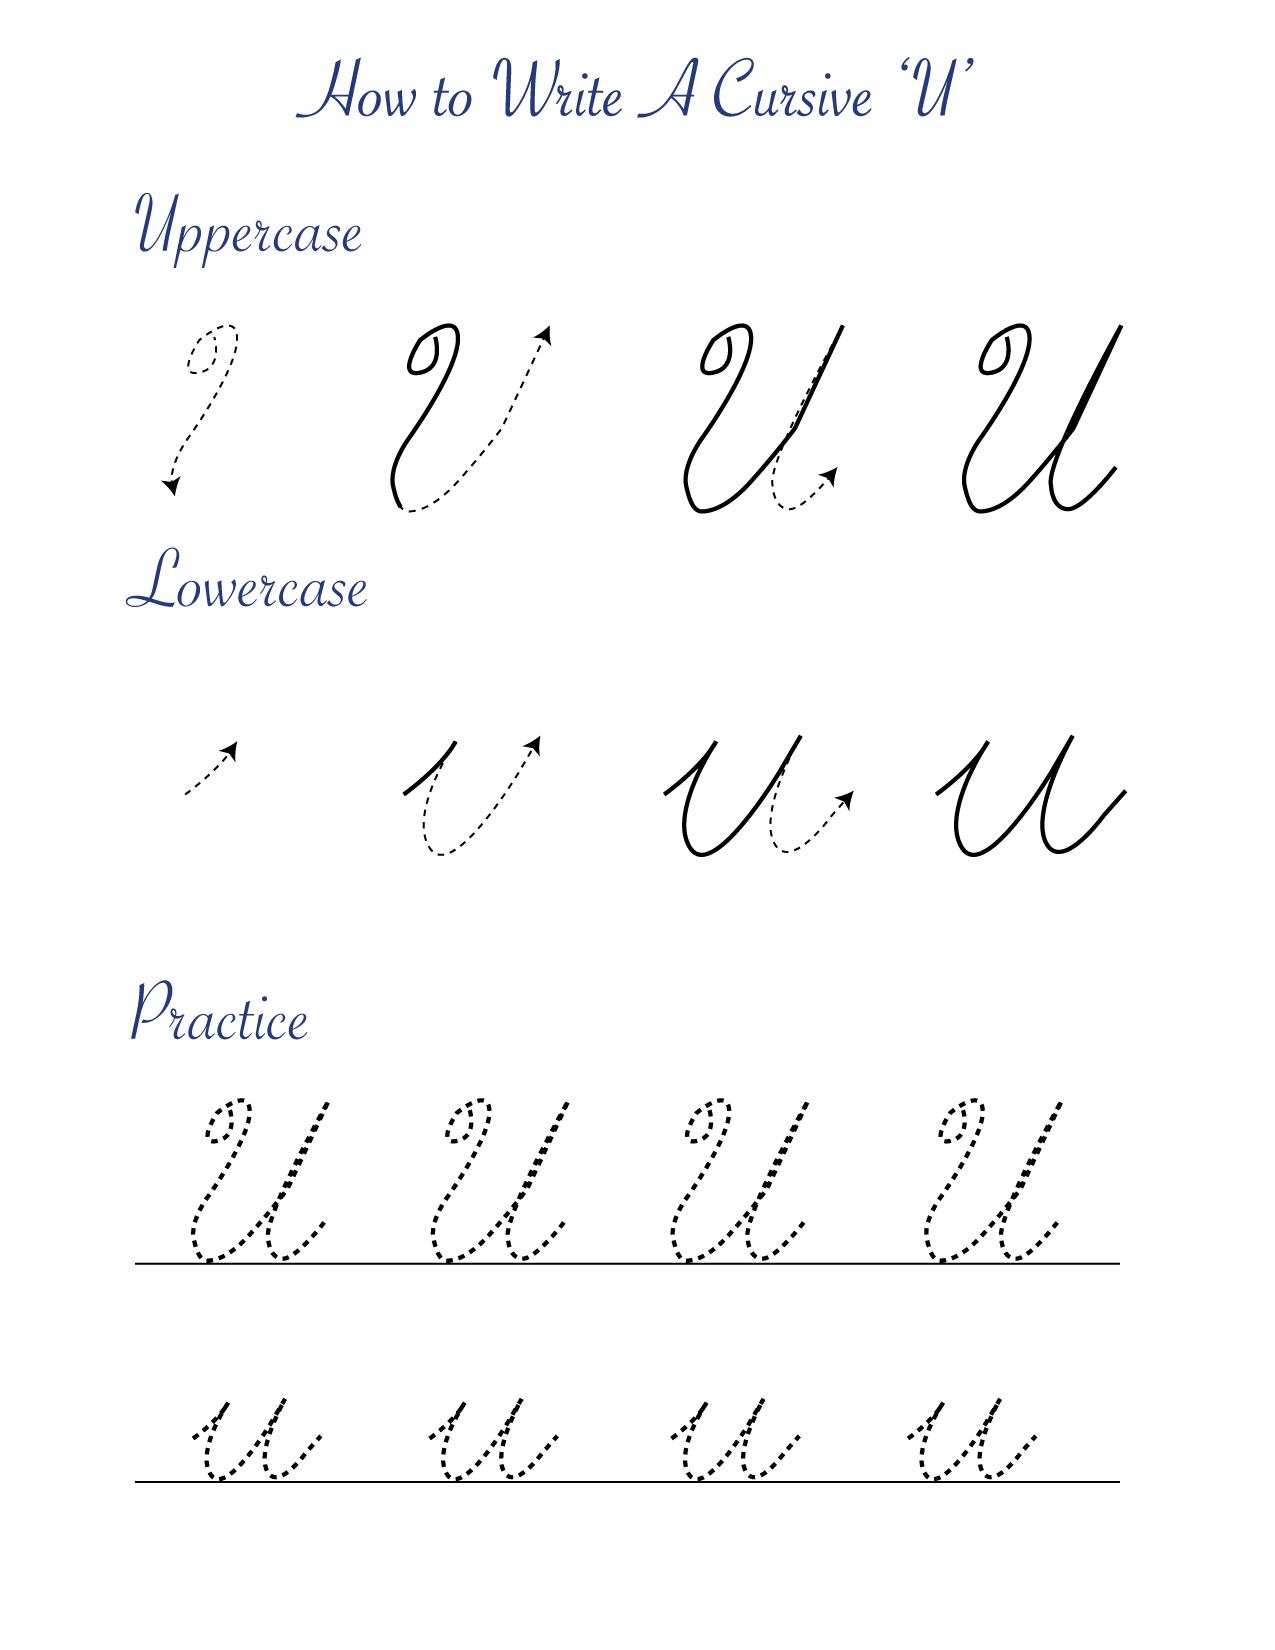 How to write a cursive U